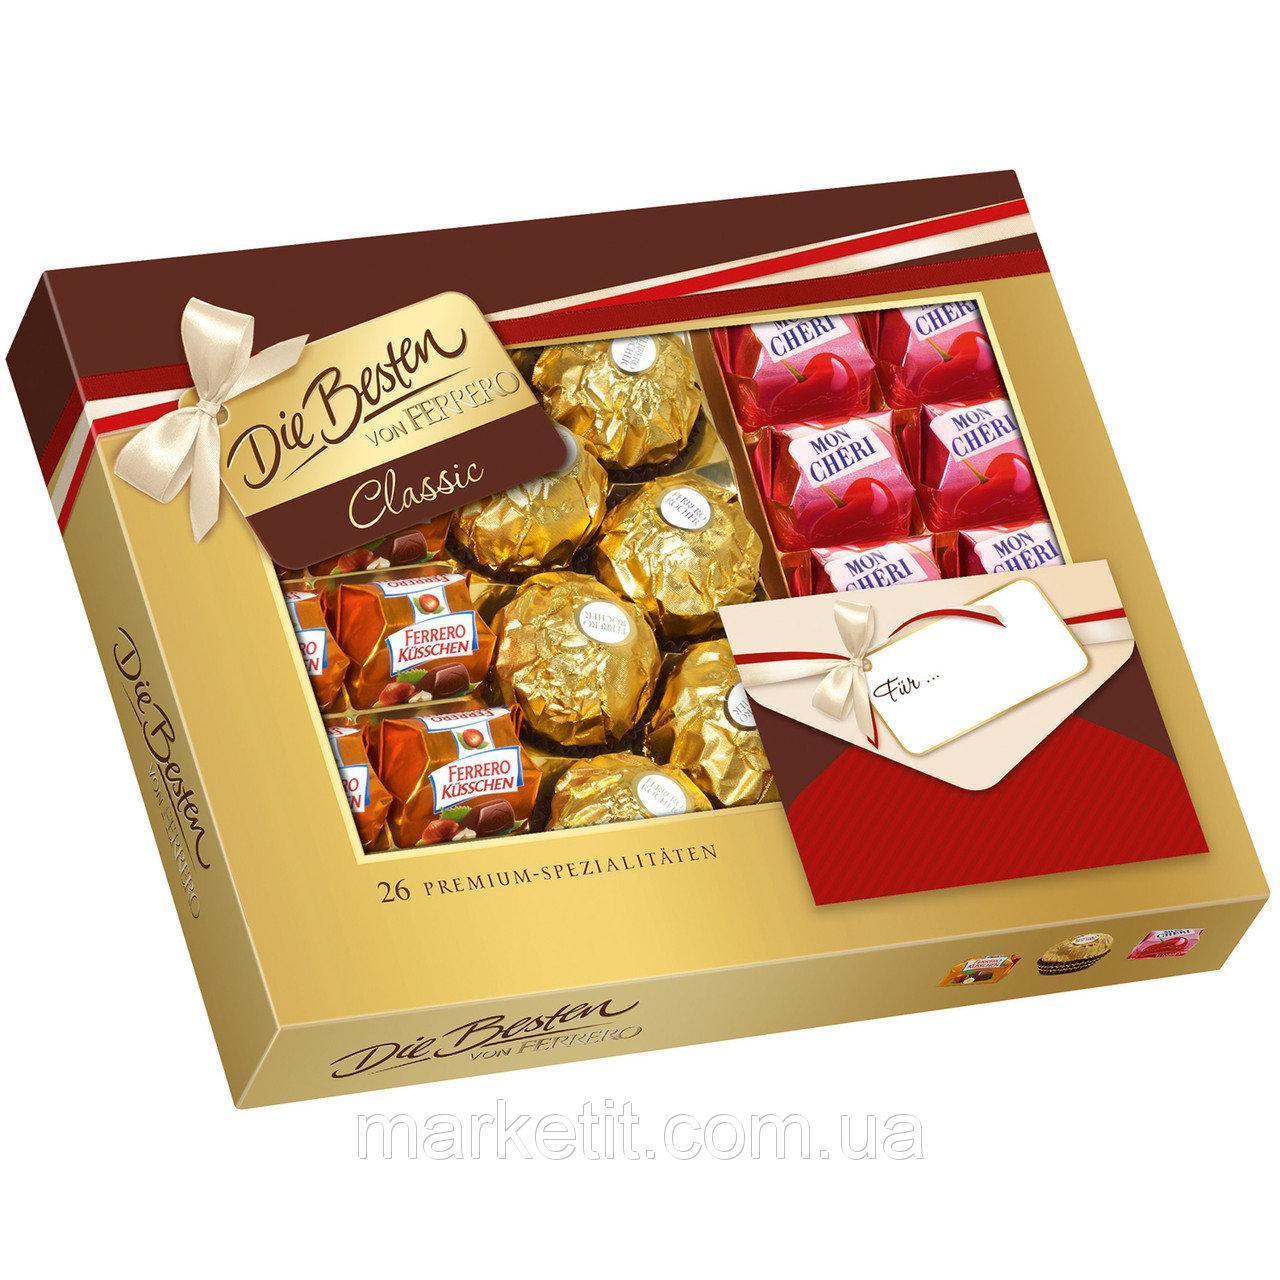 Конфеты Die Besten Classic Ferrero